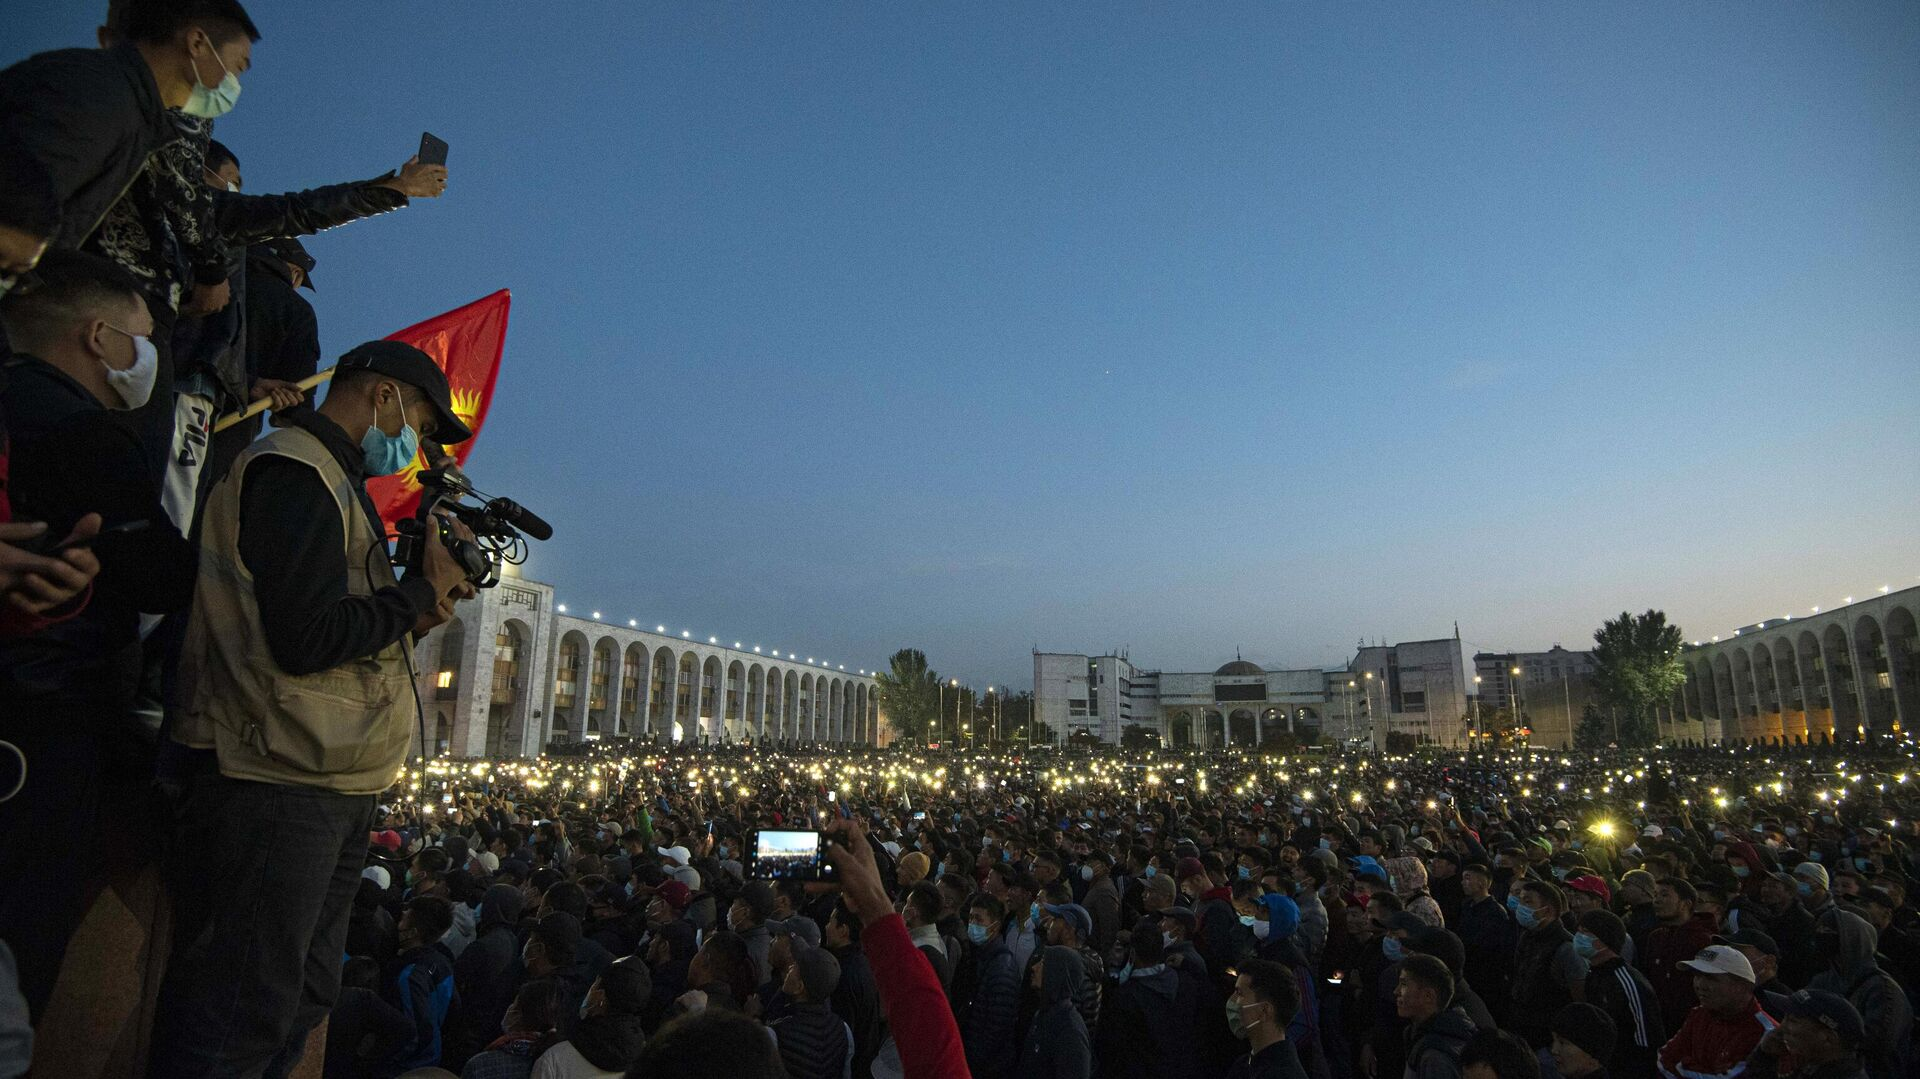 Участники акции протеста в Бишкеке - РИА Новости, 1920, 06.10.2020